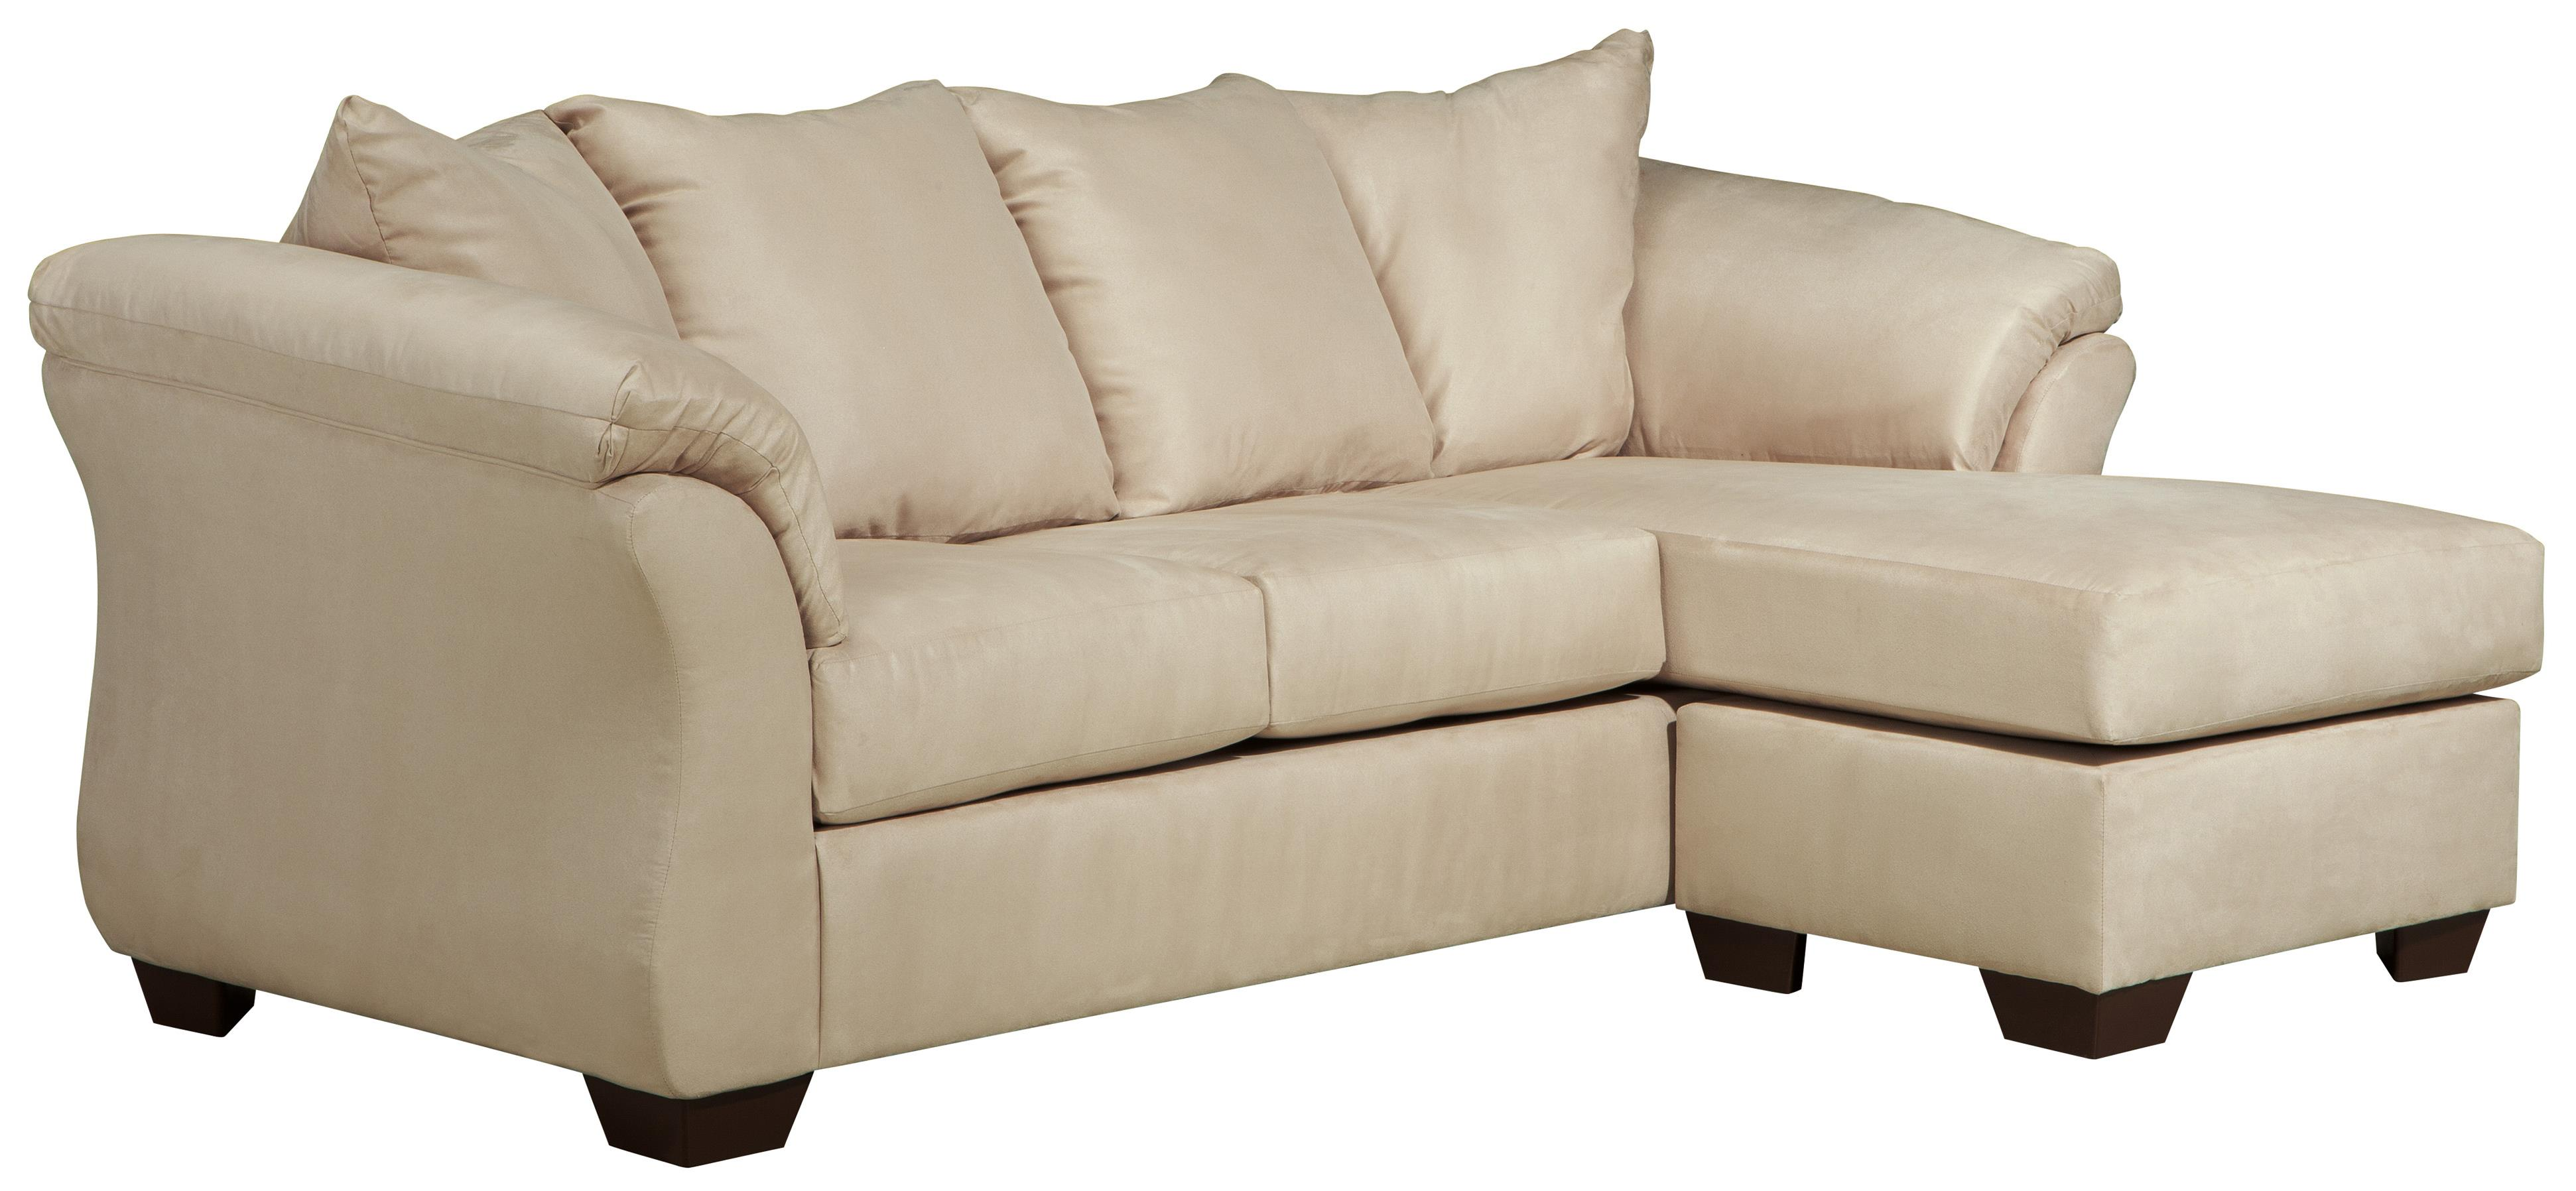 darcy sofa chaise ashley furniture contemporary sofas signature design stone 7500018